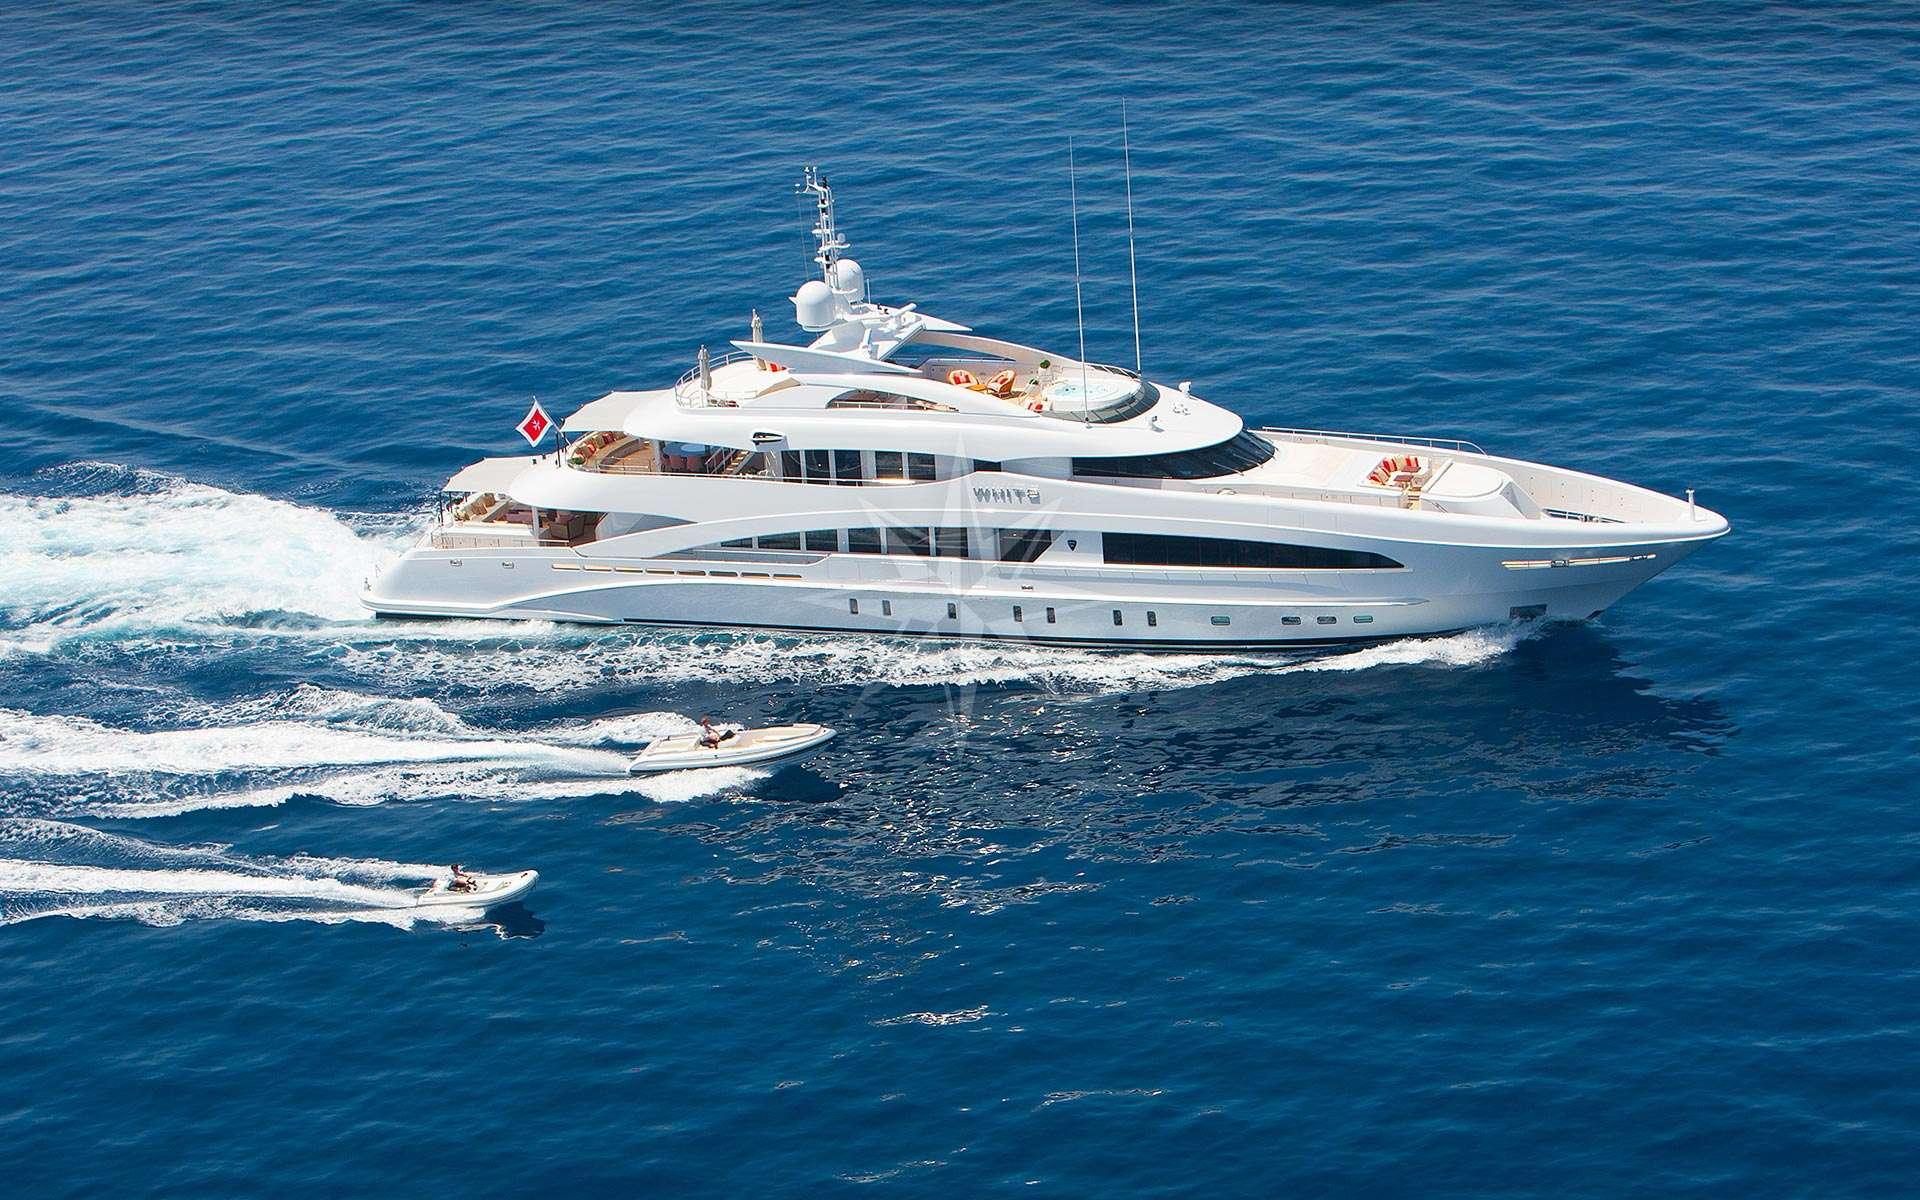 Moter Yacht